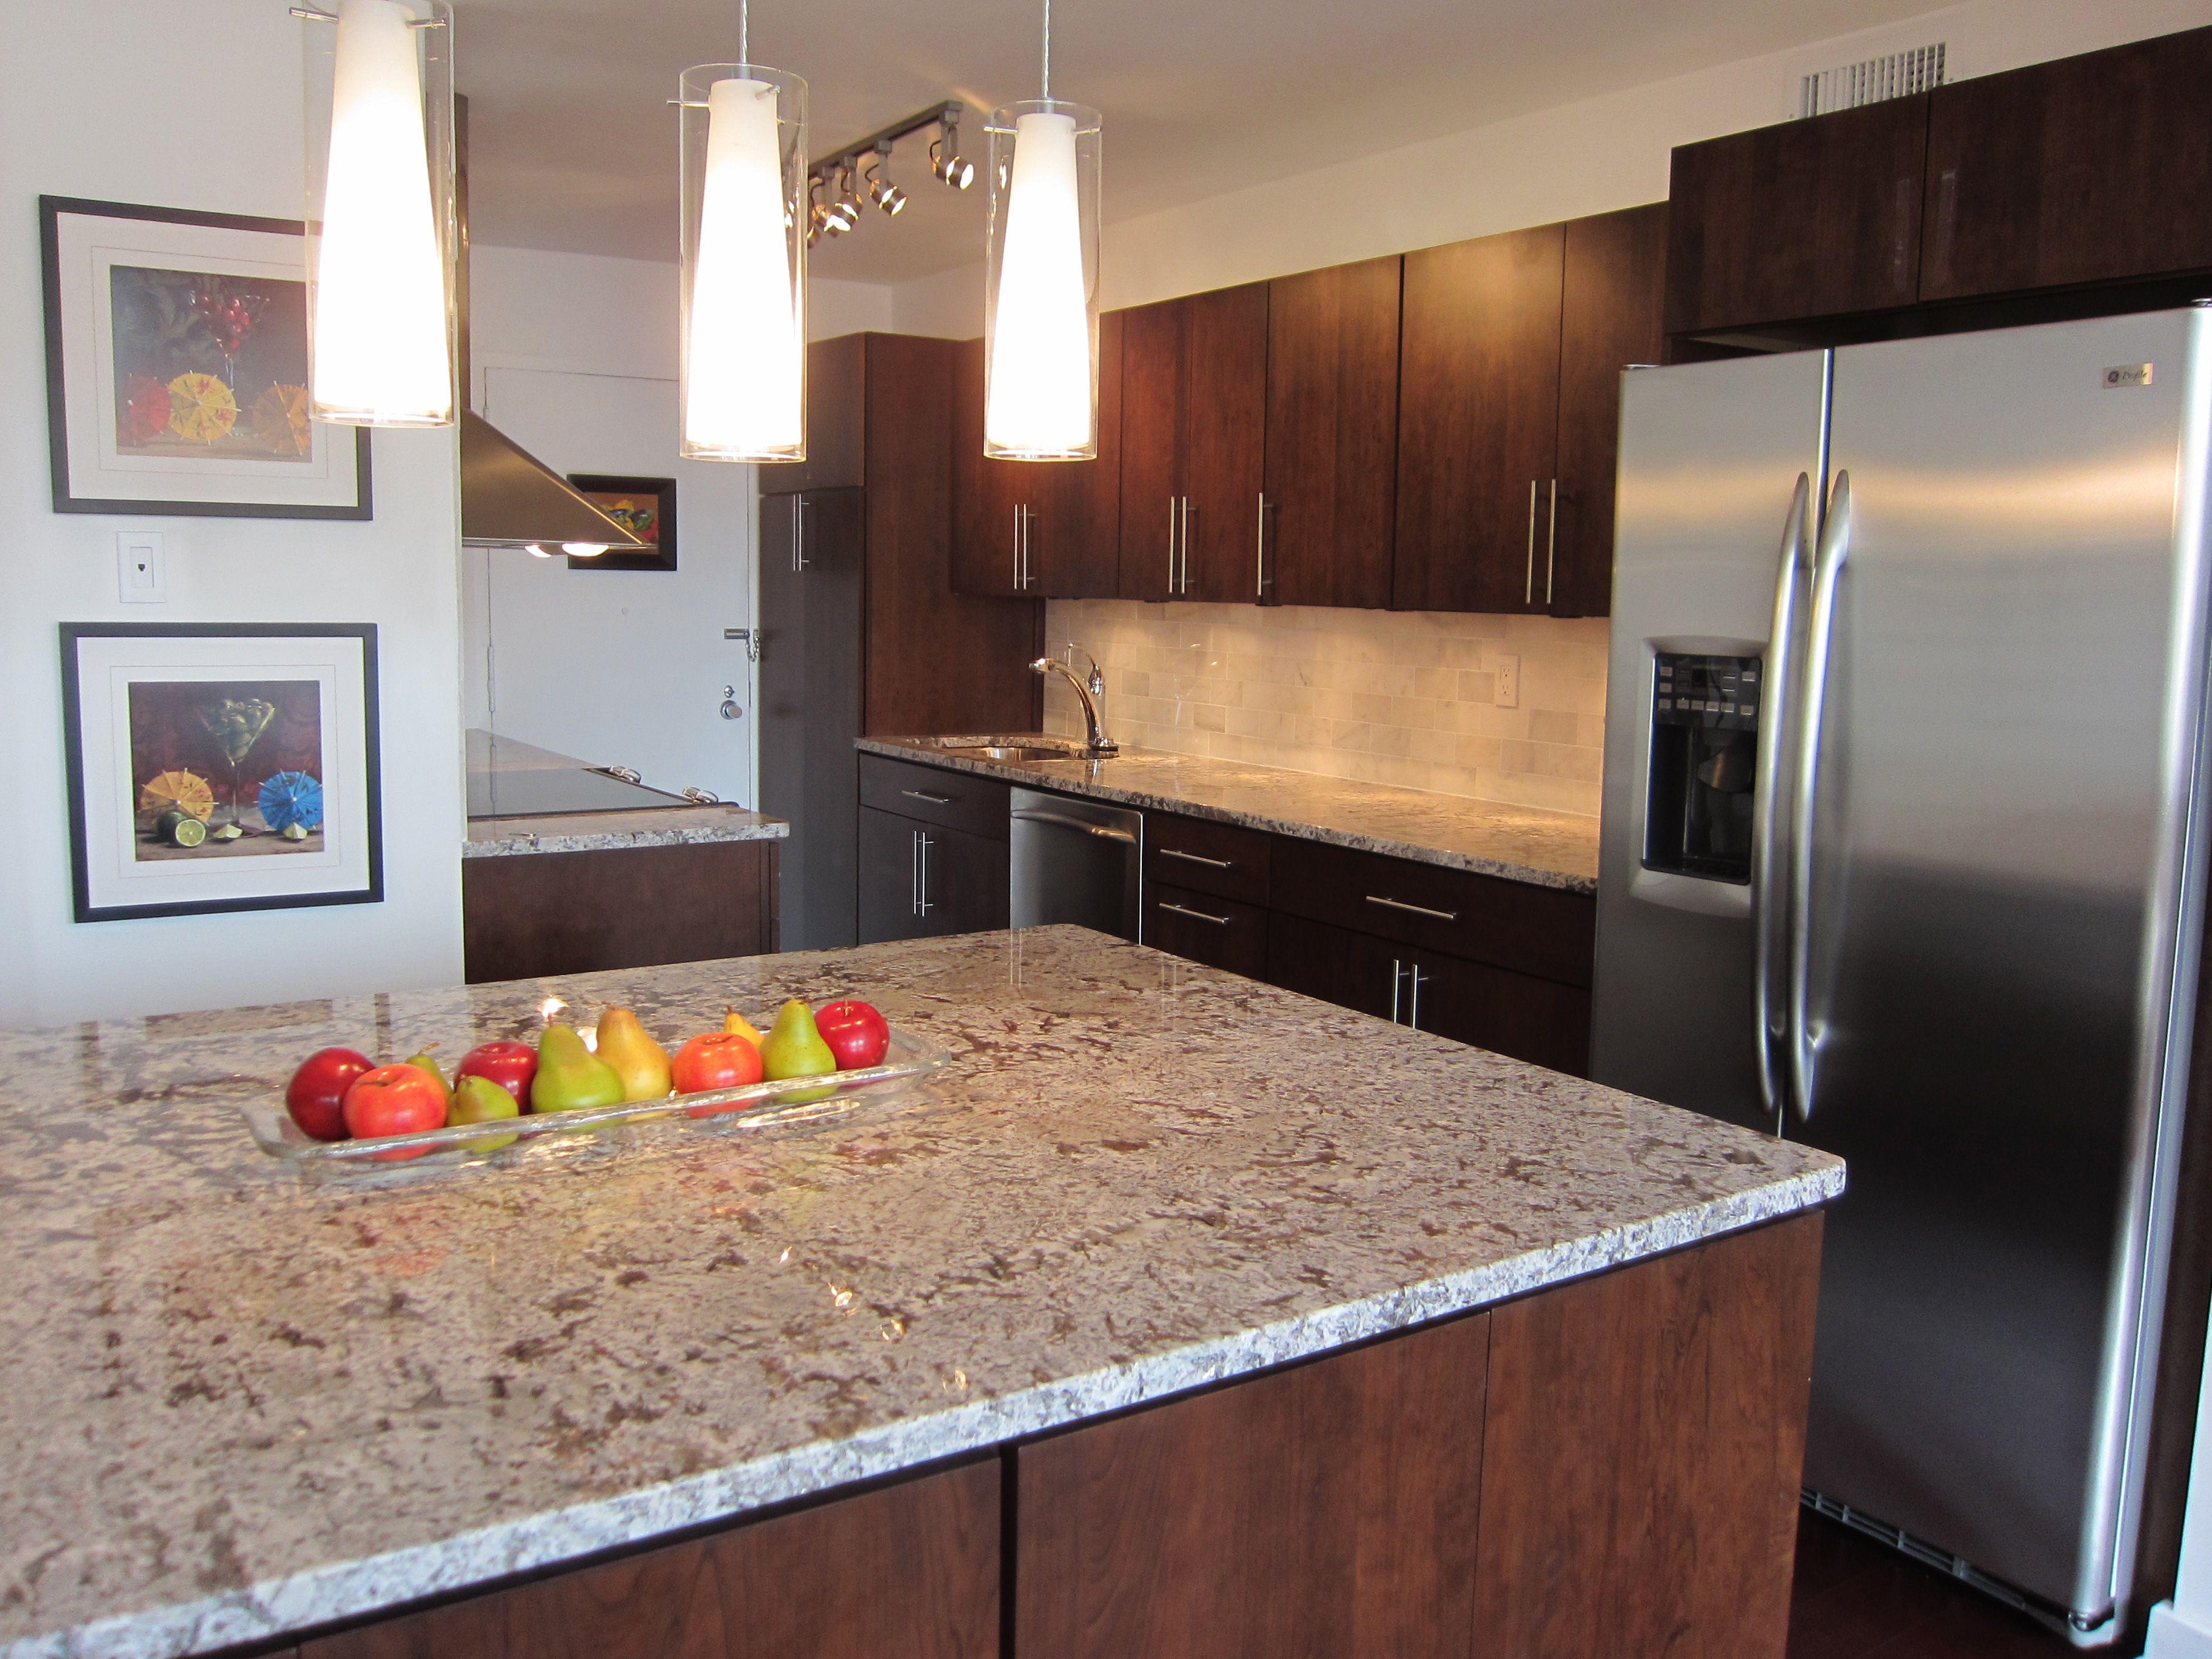 Kitchen remodeling photo gallery brewer contracting remodeling kitchen bath floor - Bathroom remodel kenosha wi ...